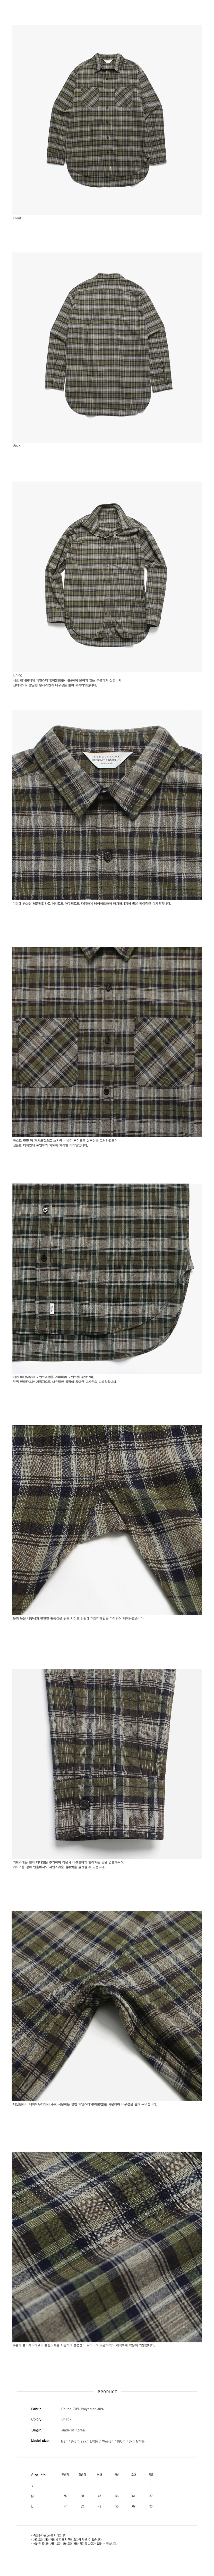 Tartan_Check_Shirt_Khaki_Brown_02.jpg